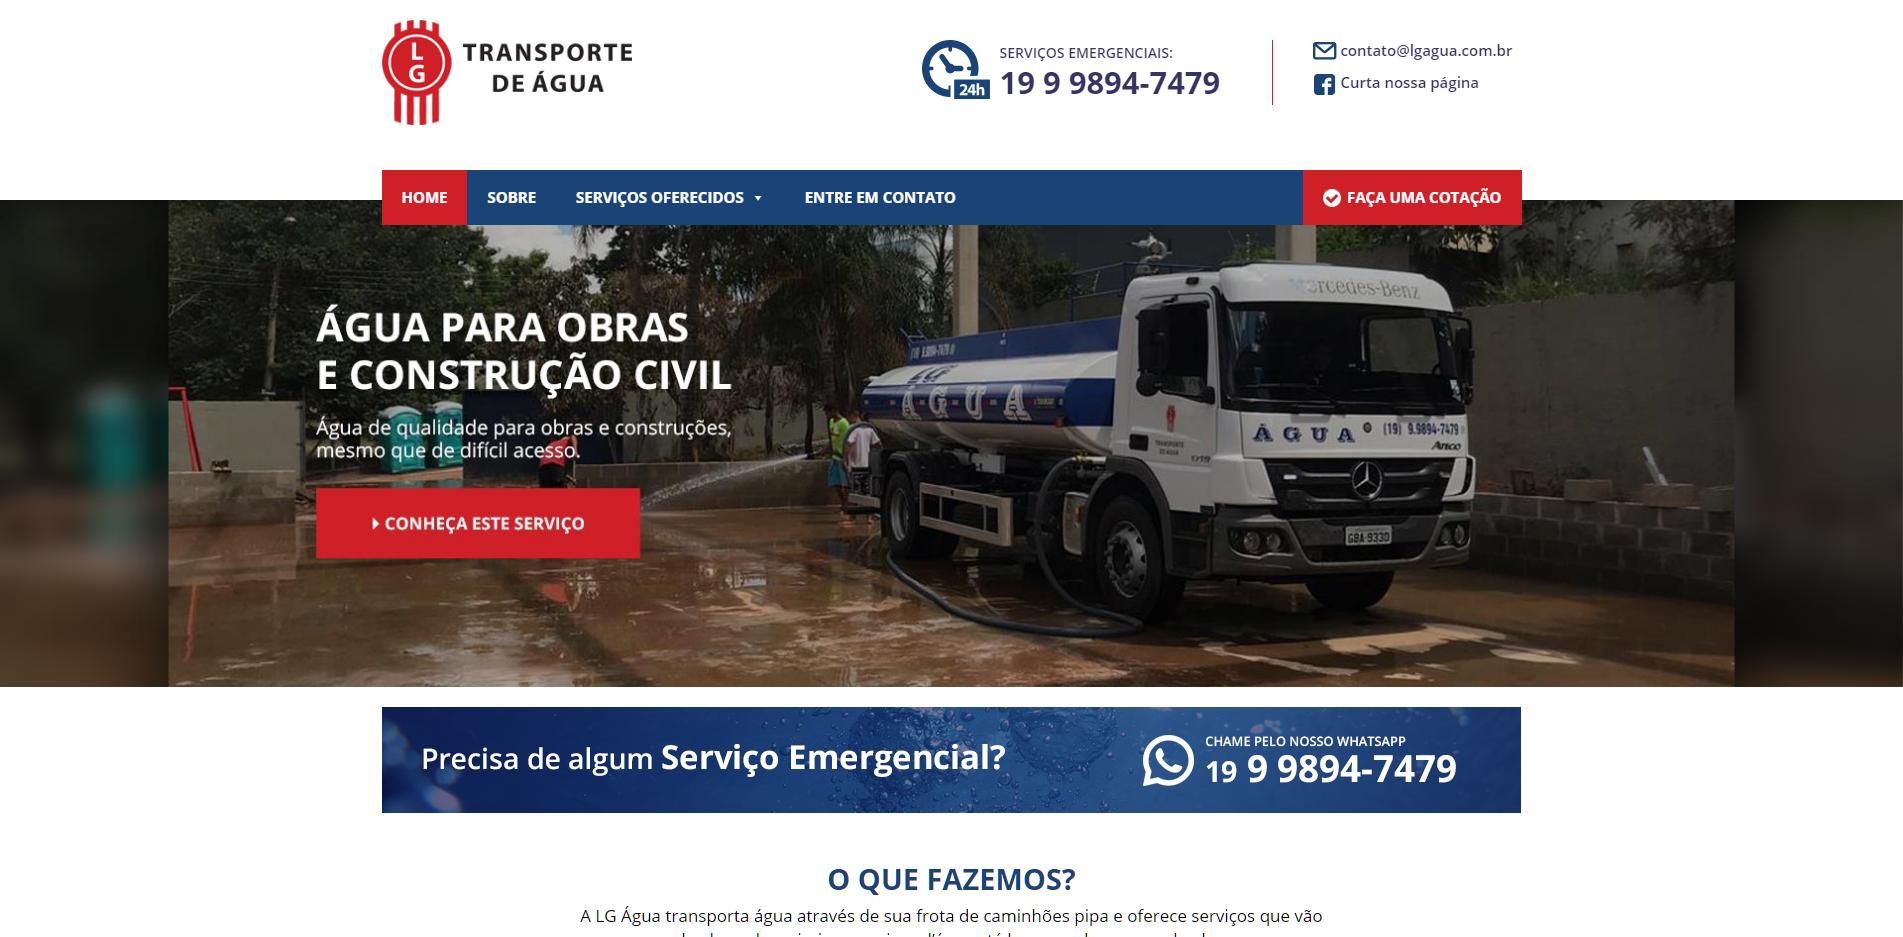 LG Transporte de Água